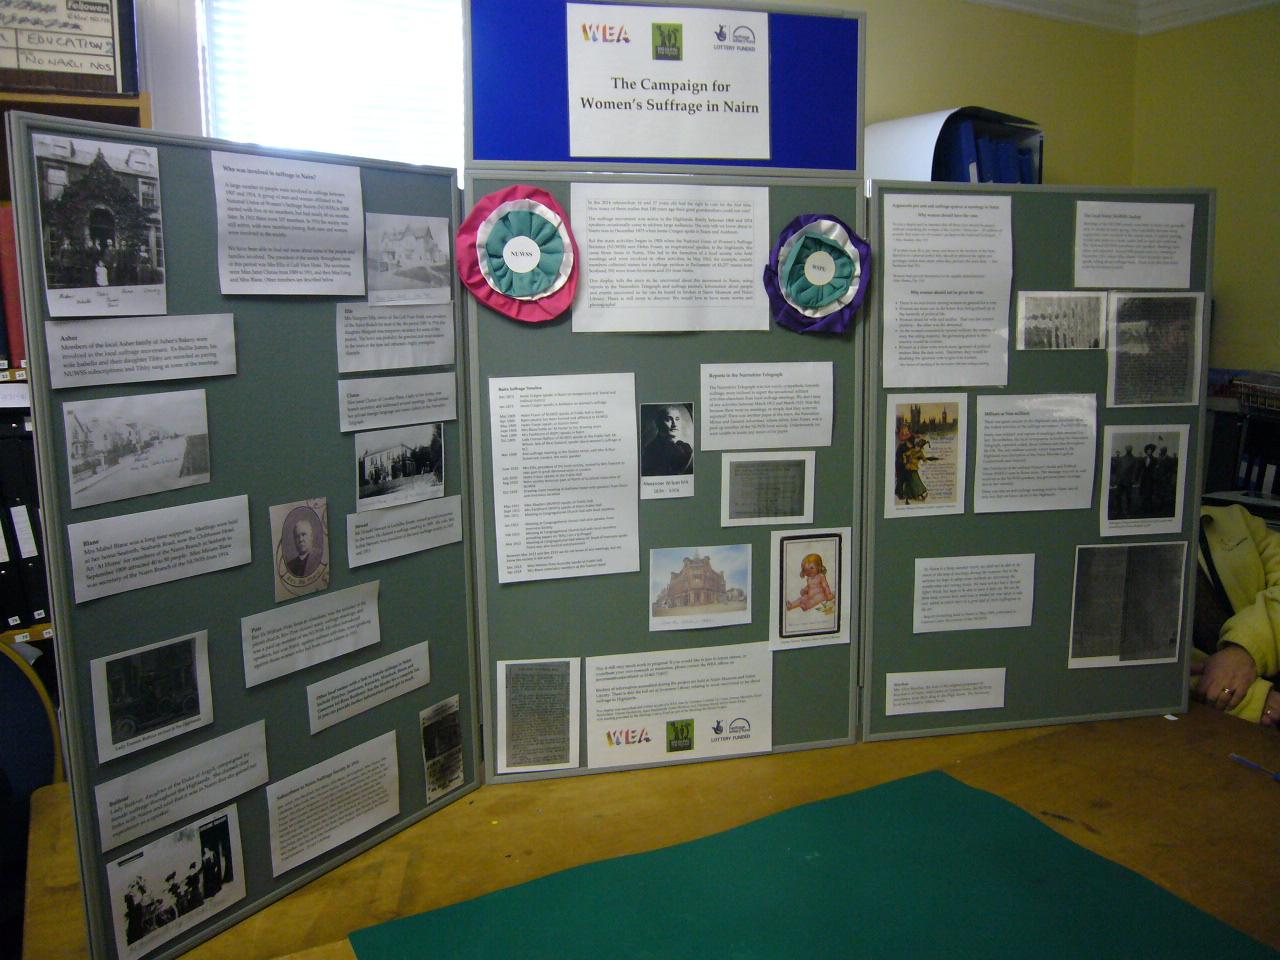 Nairn display